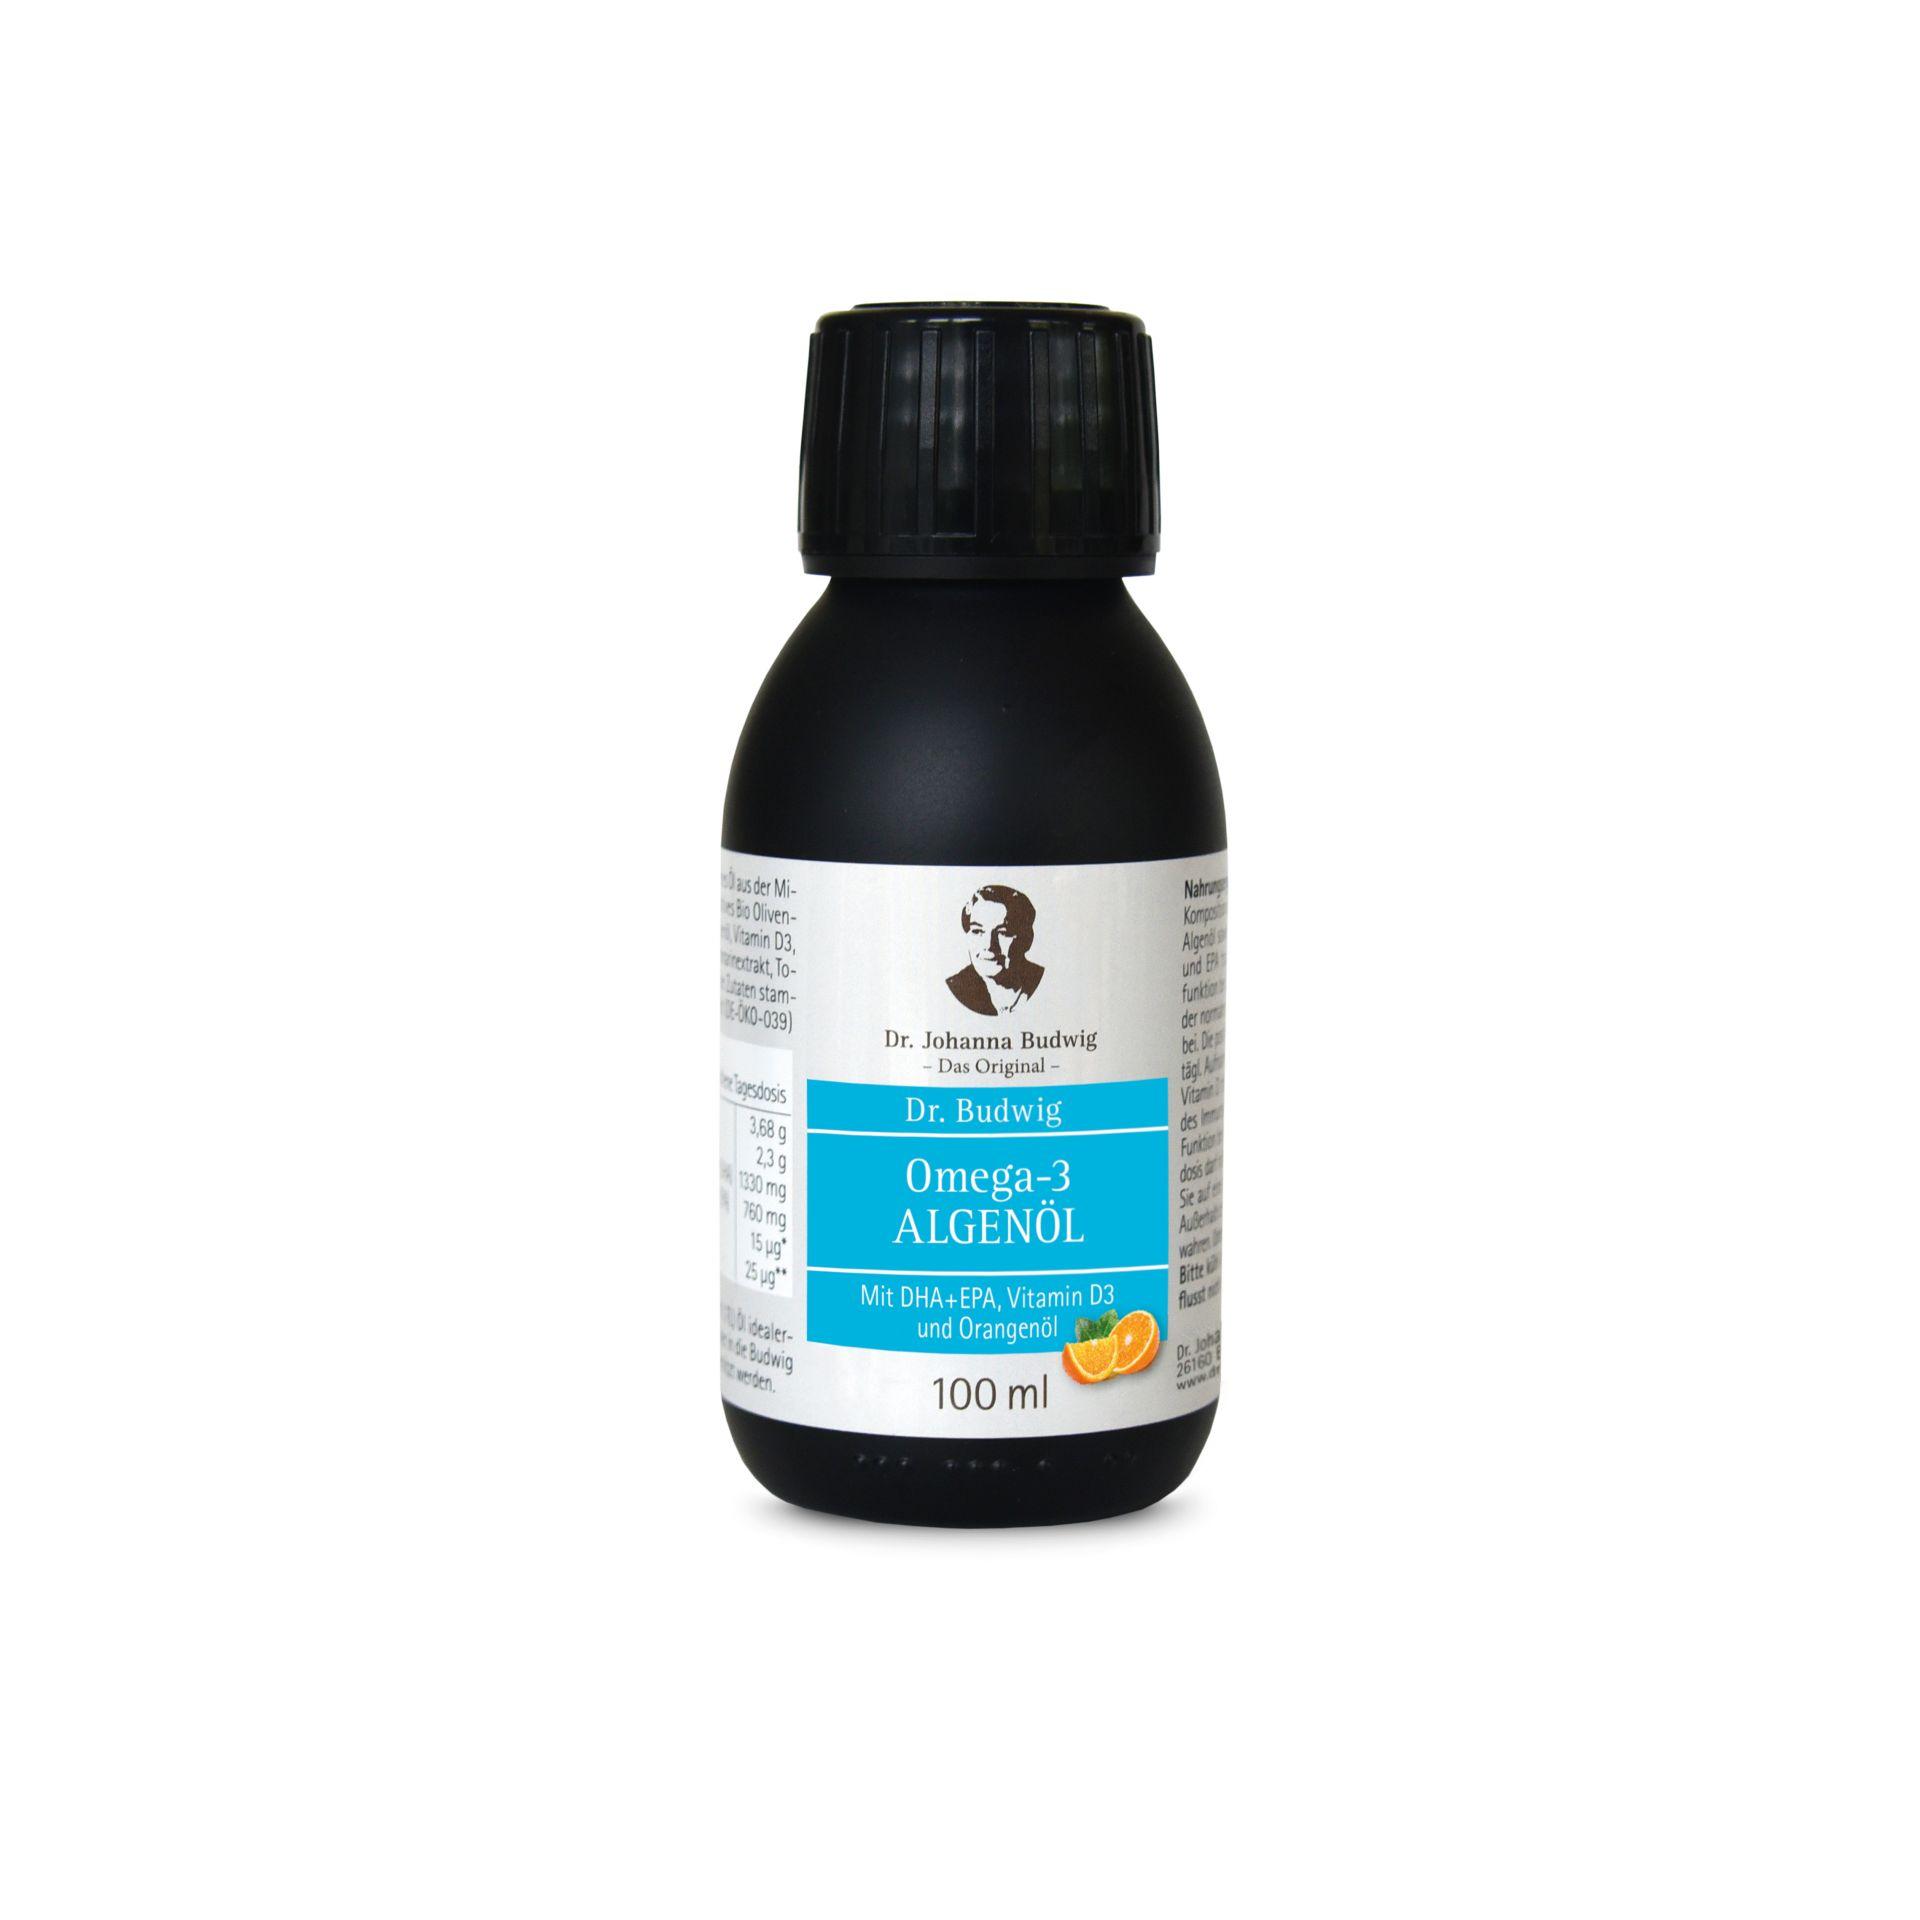 Dr. Budwig Omega-3 Algenöl